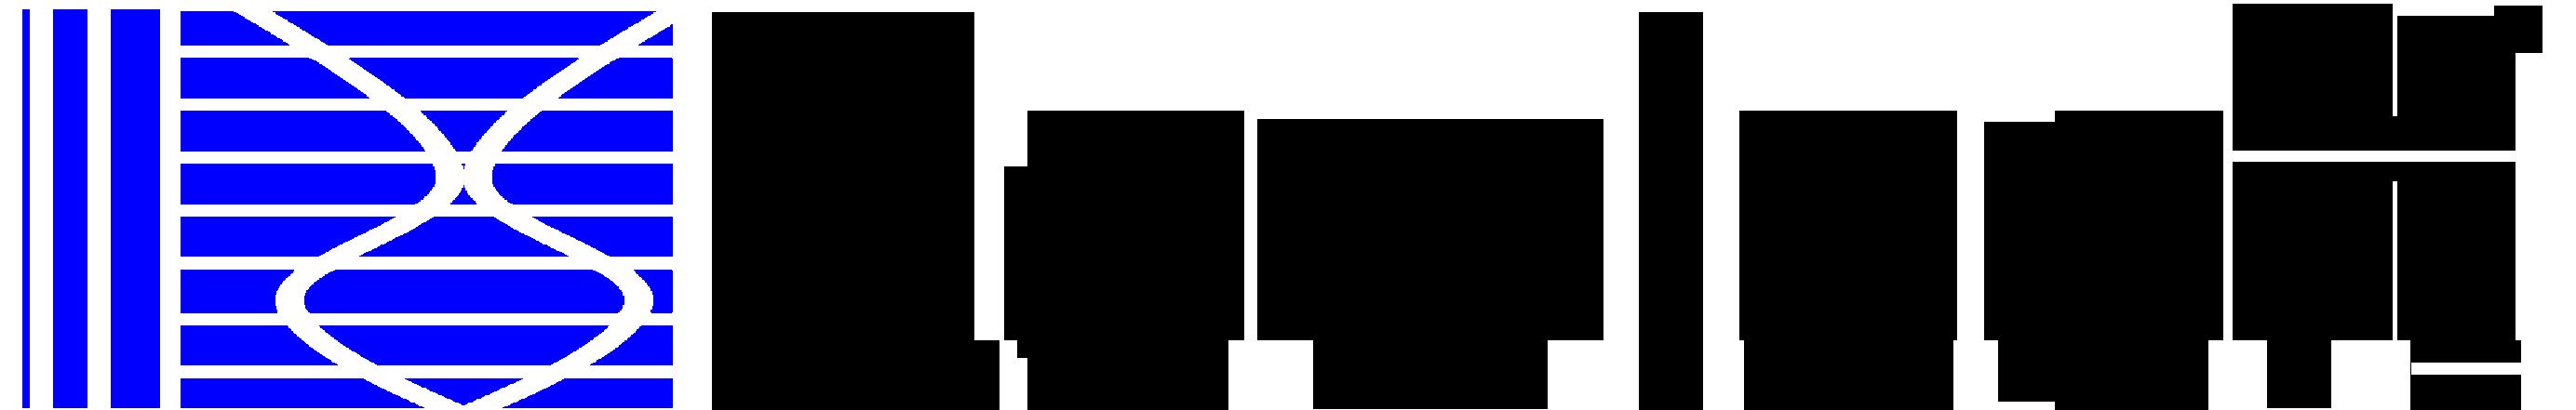 https://www.oscware.de/images/Rowisoft-Logo.png